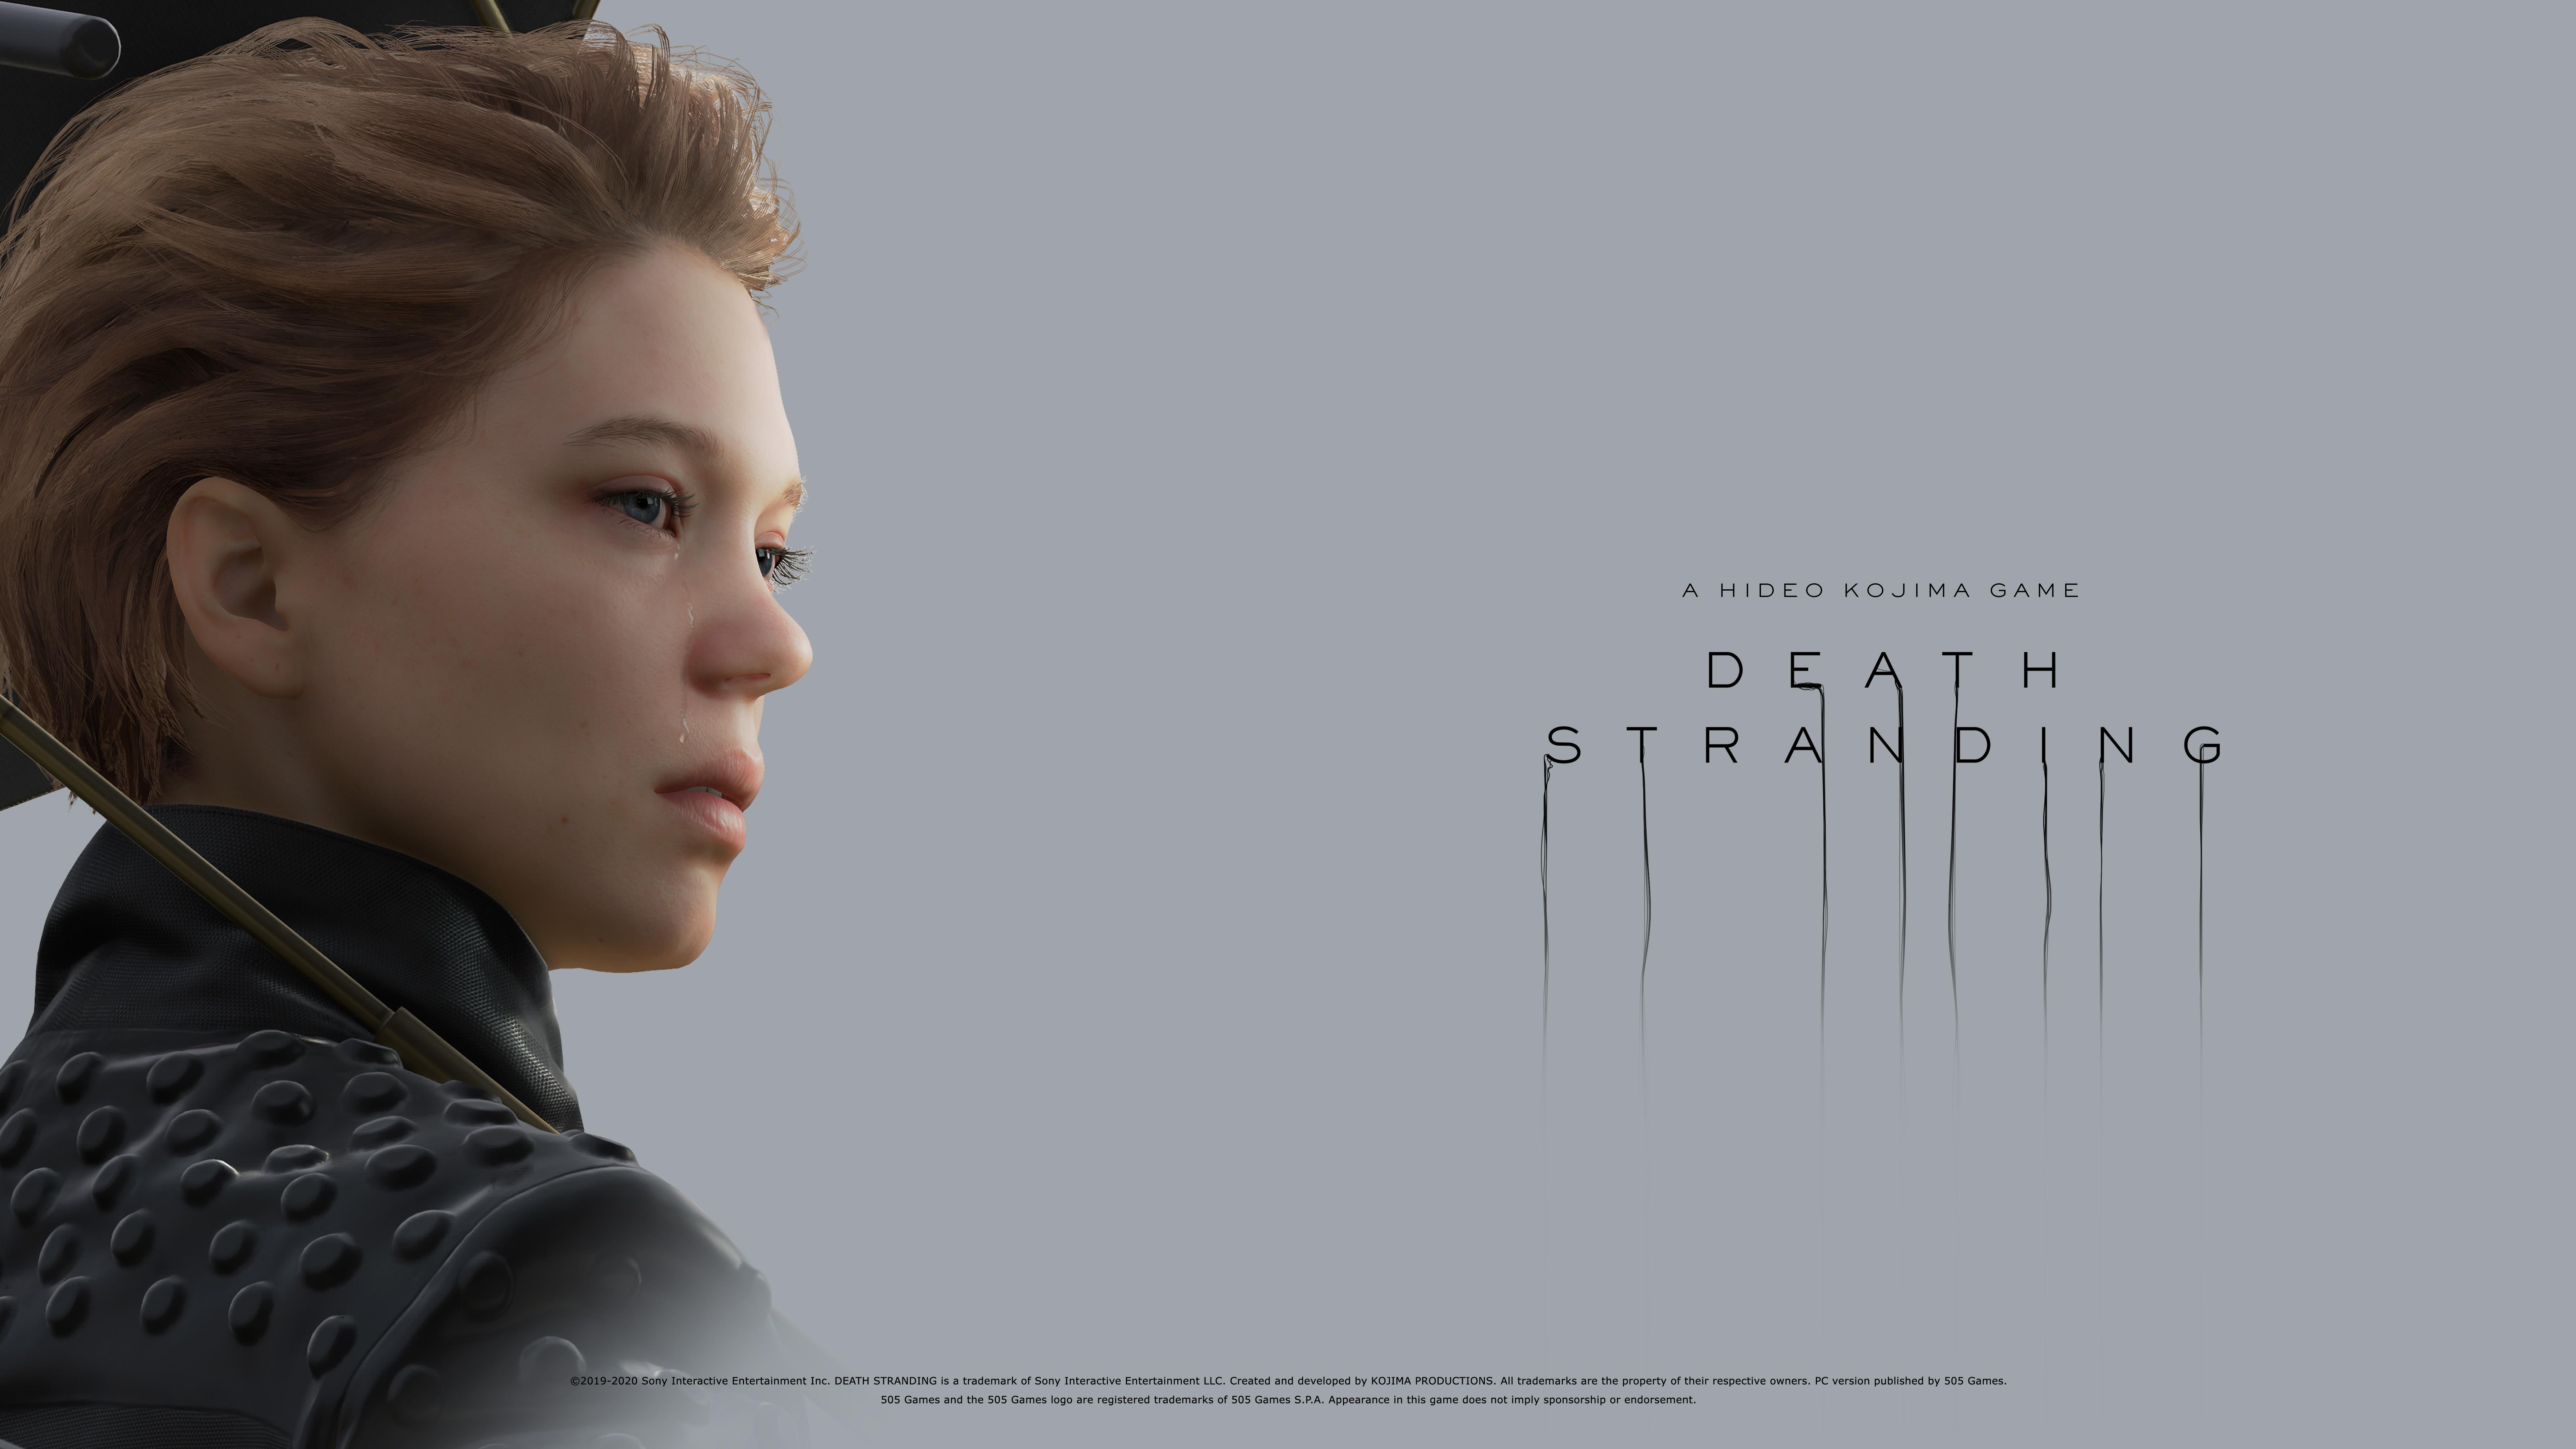 General 7680x4320 Death Stranding Hideo Kojima Fragile (Death Stranding) Léa Seydoux video games video game girls